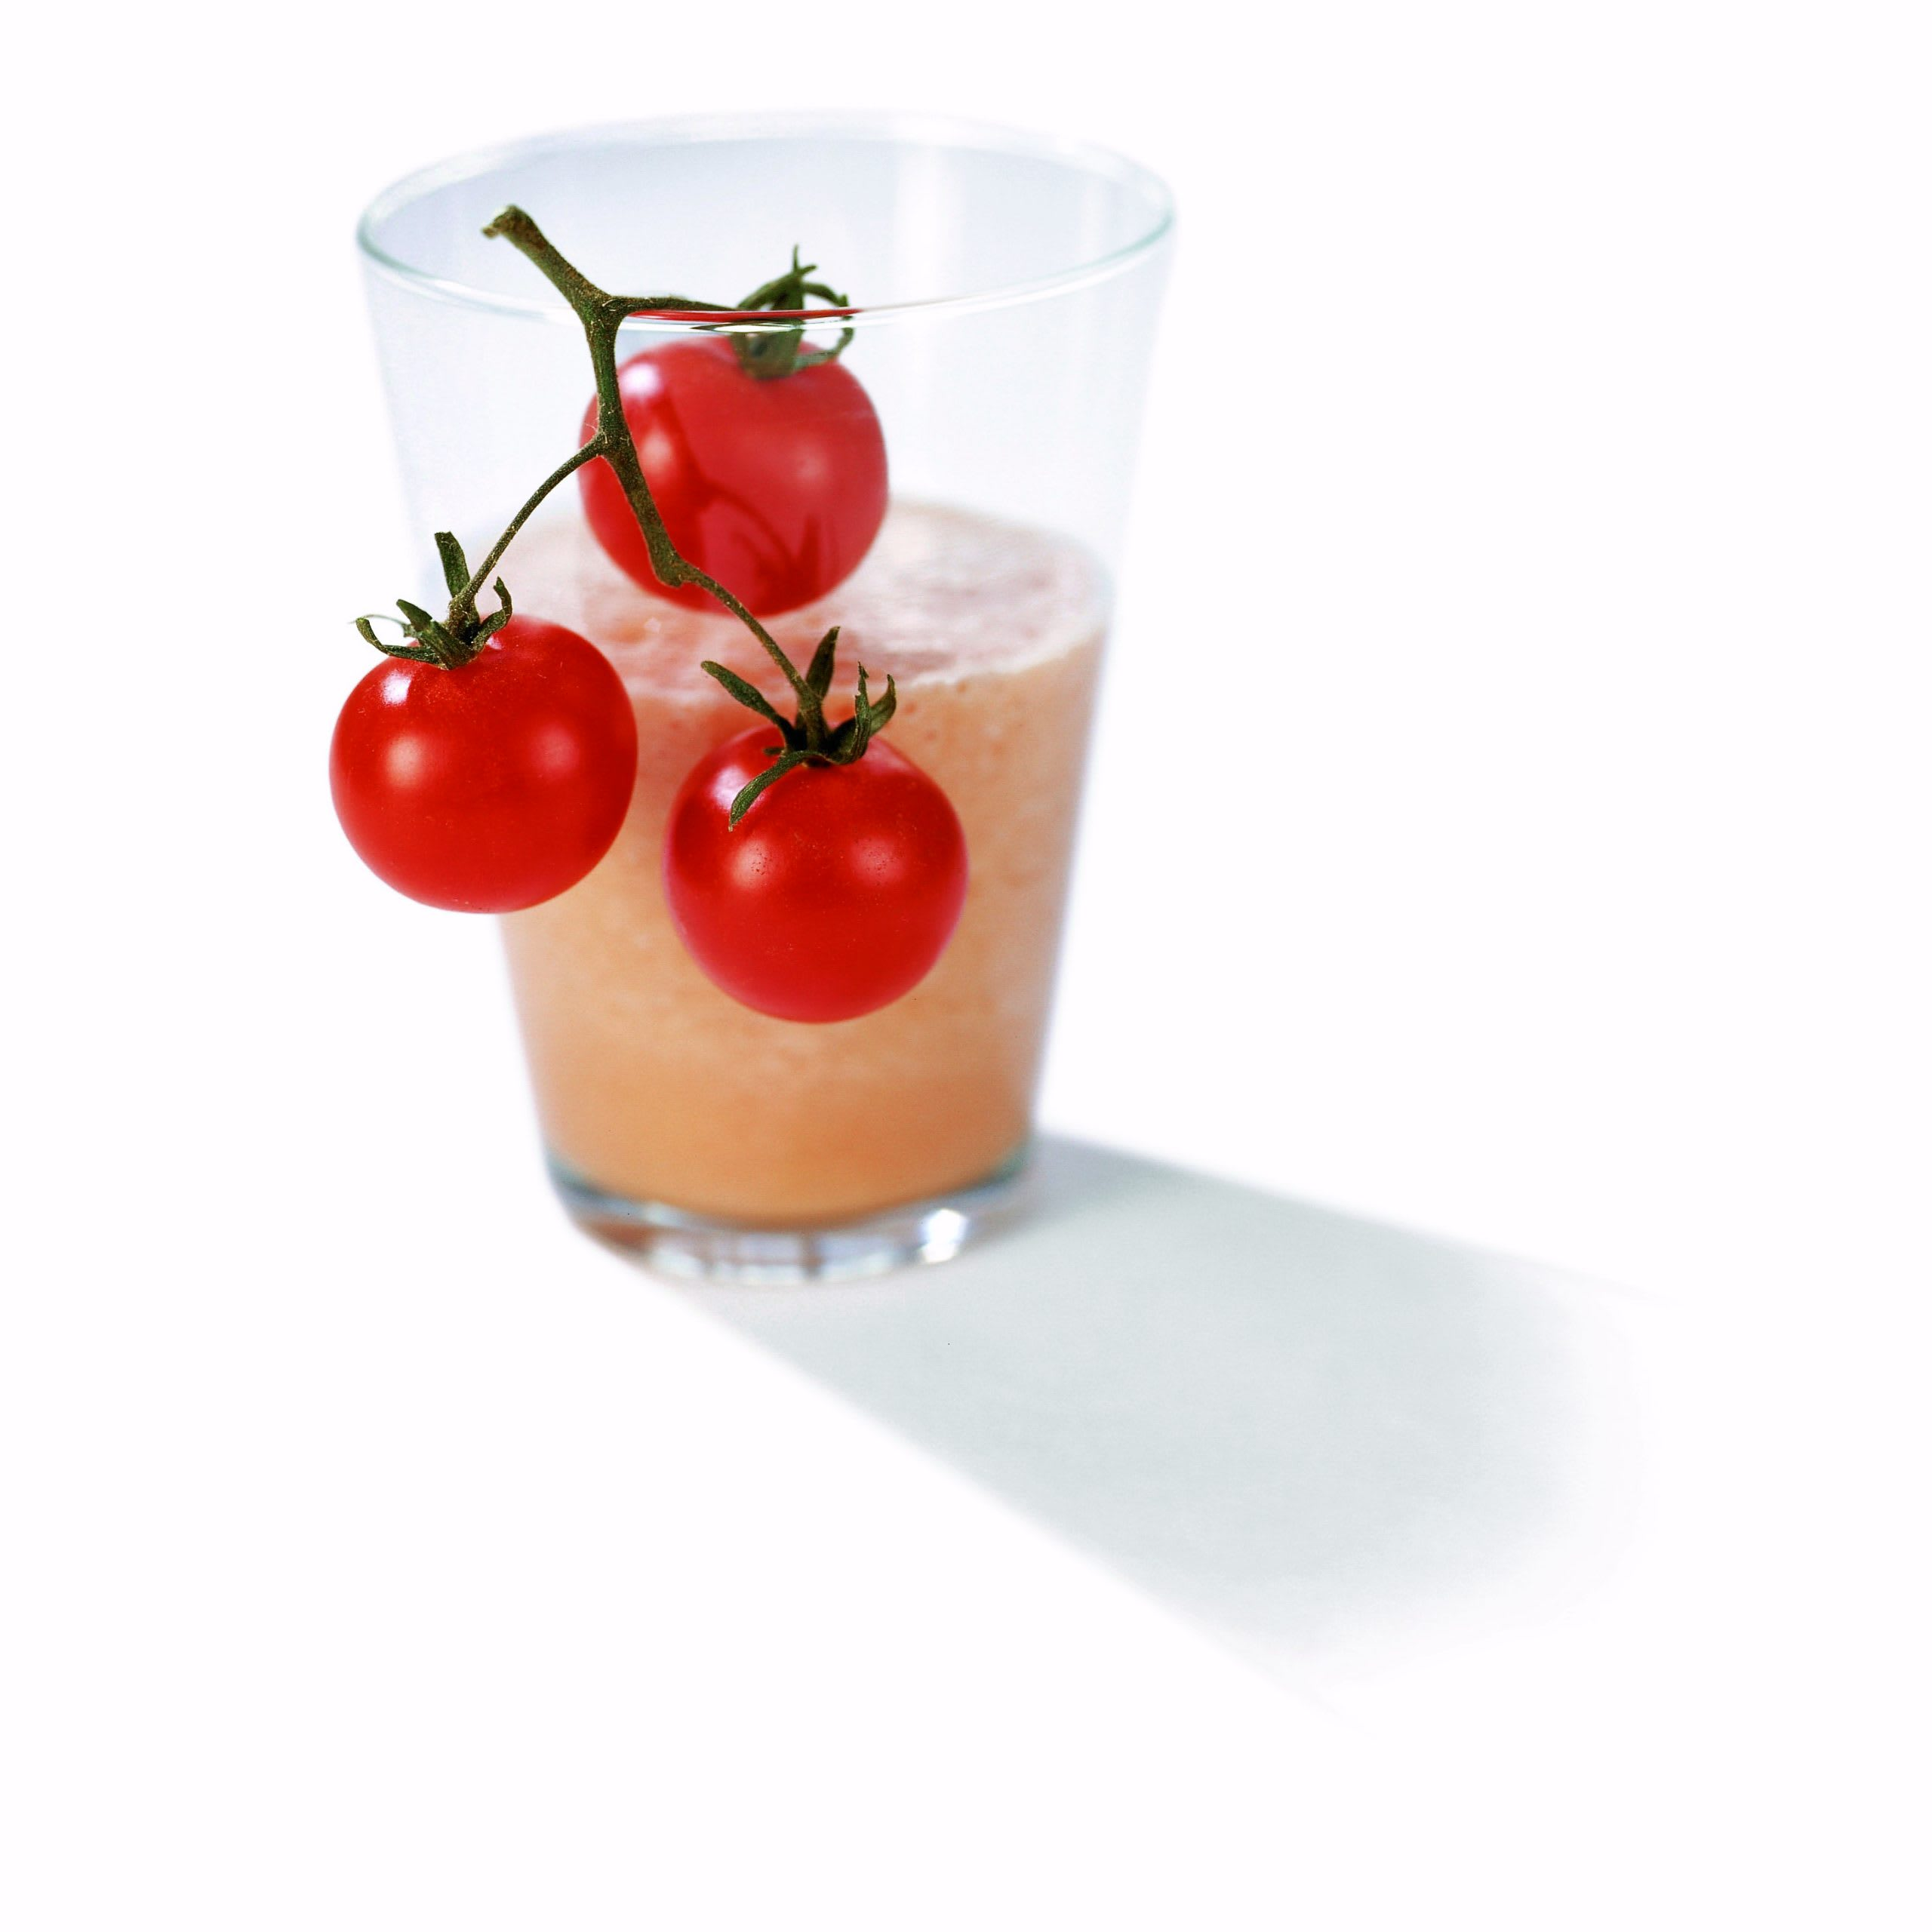 Melonen-Tomaten-Saft